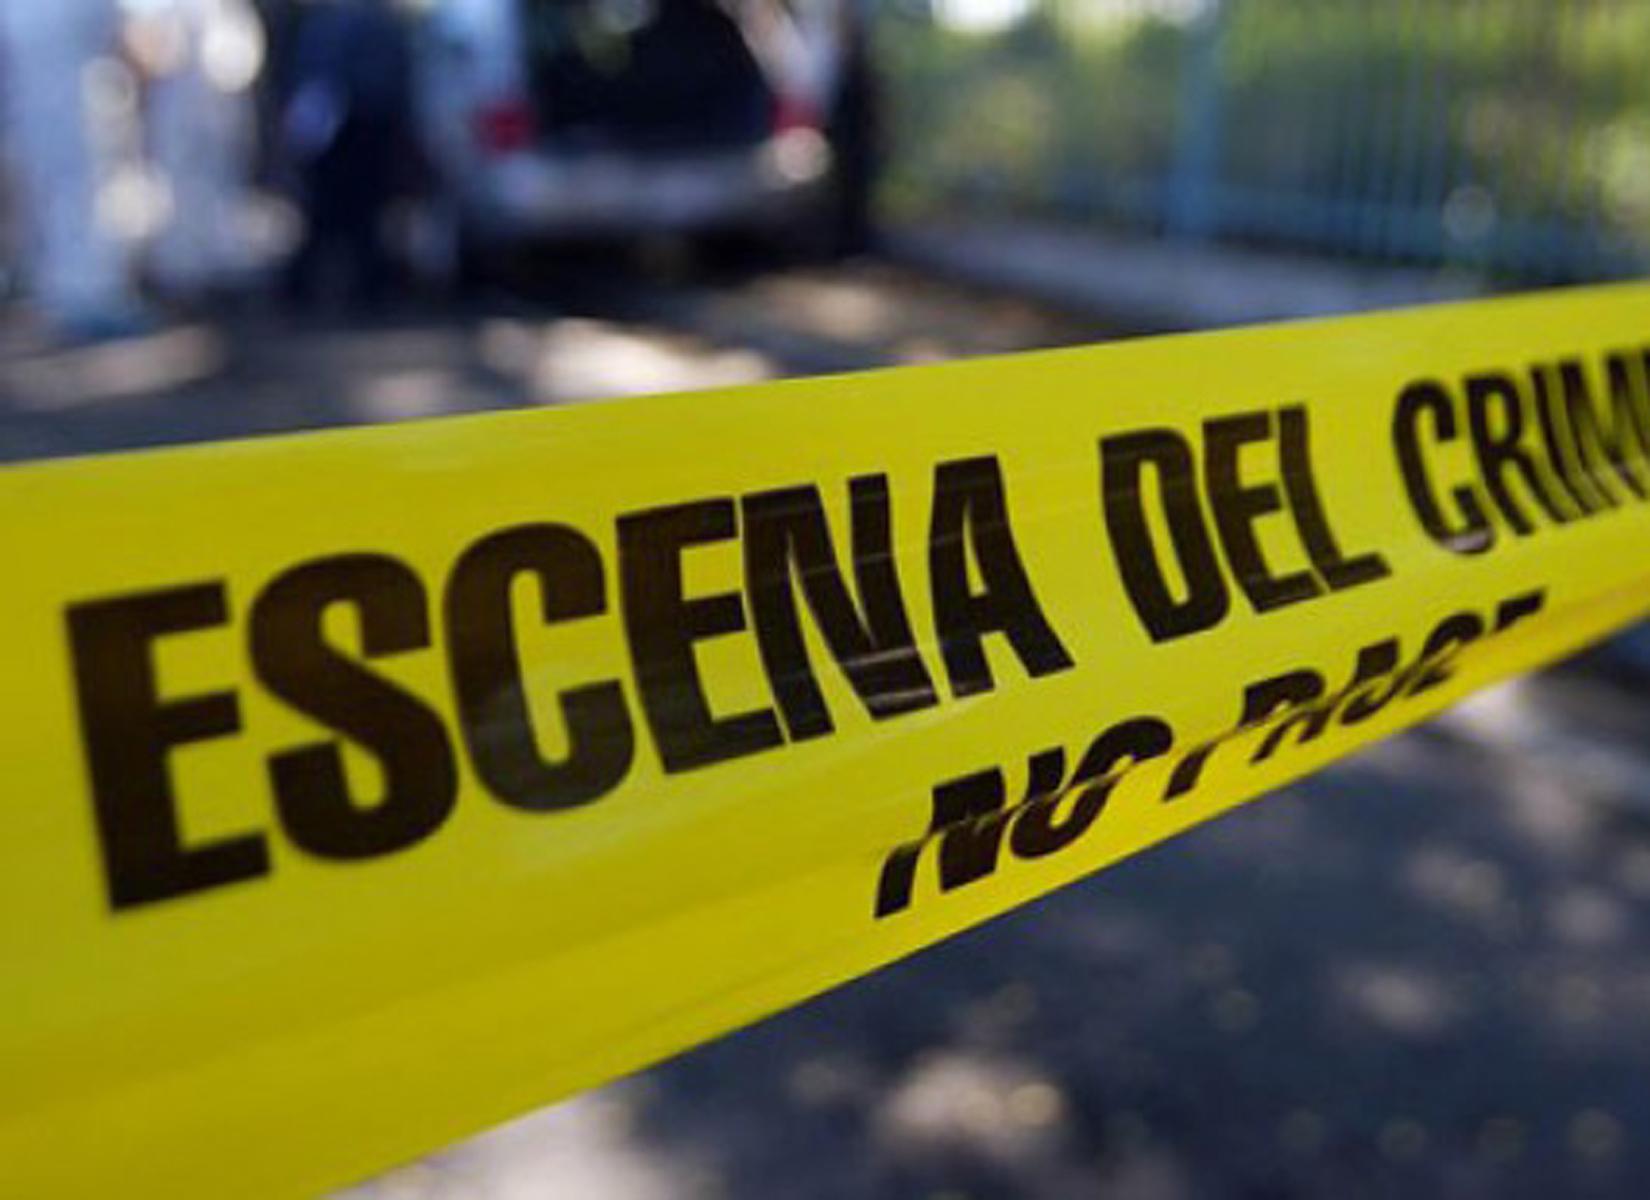 Nicaragua: Localizan cráneo de mujer decapitada tras prolongada búsqueda